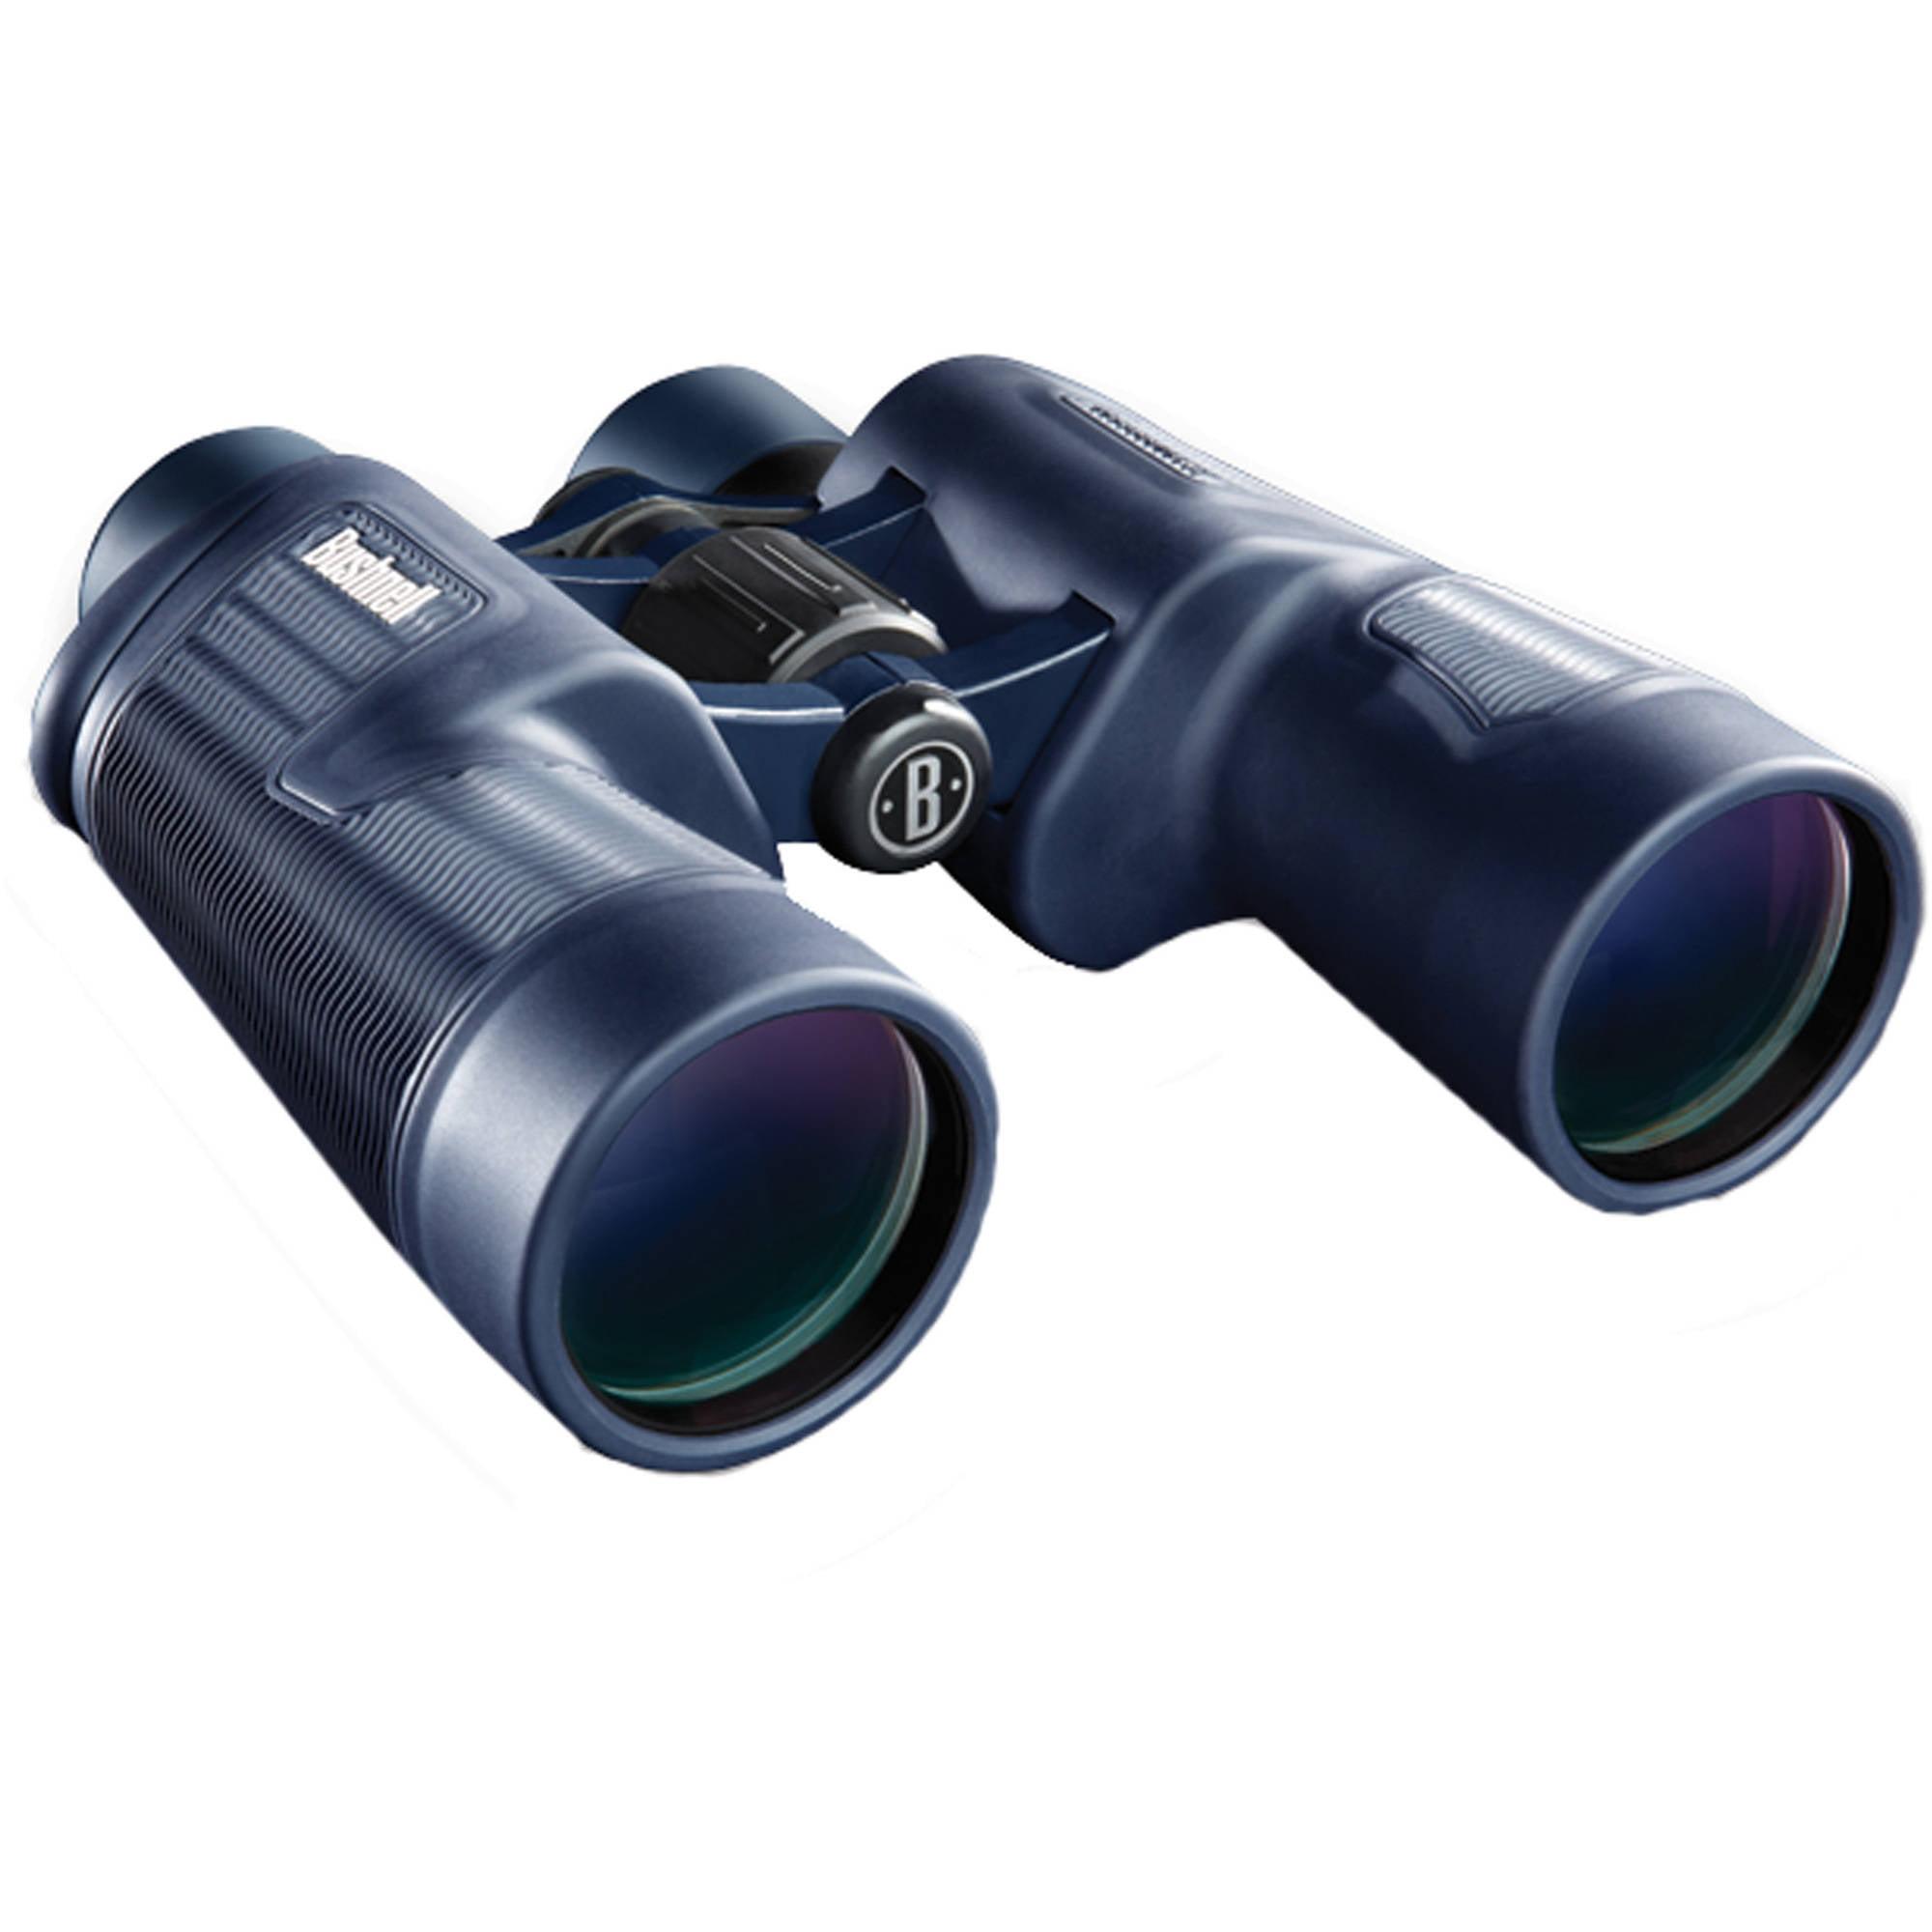 Bushnell H2O Series Binoculars 7x50 Black Porro BAK-4